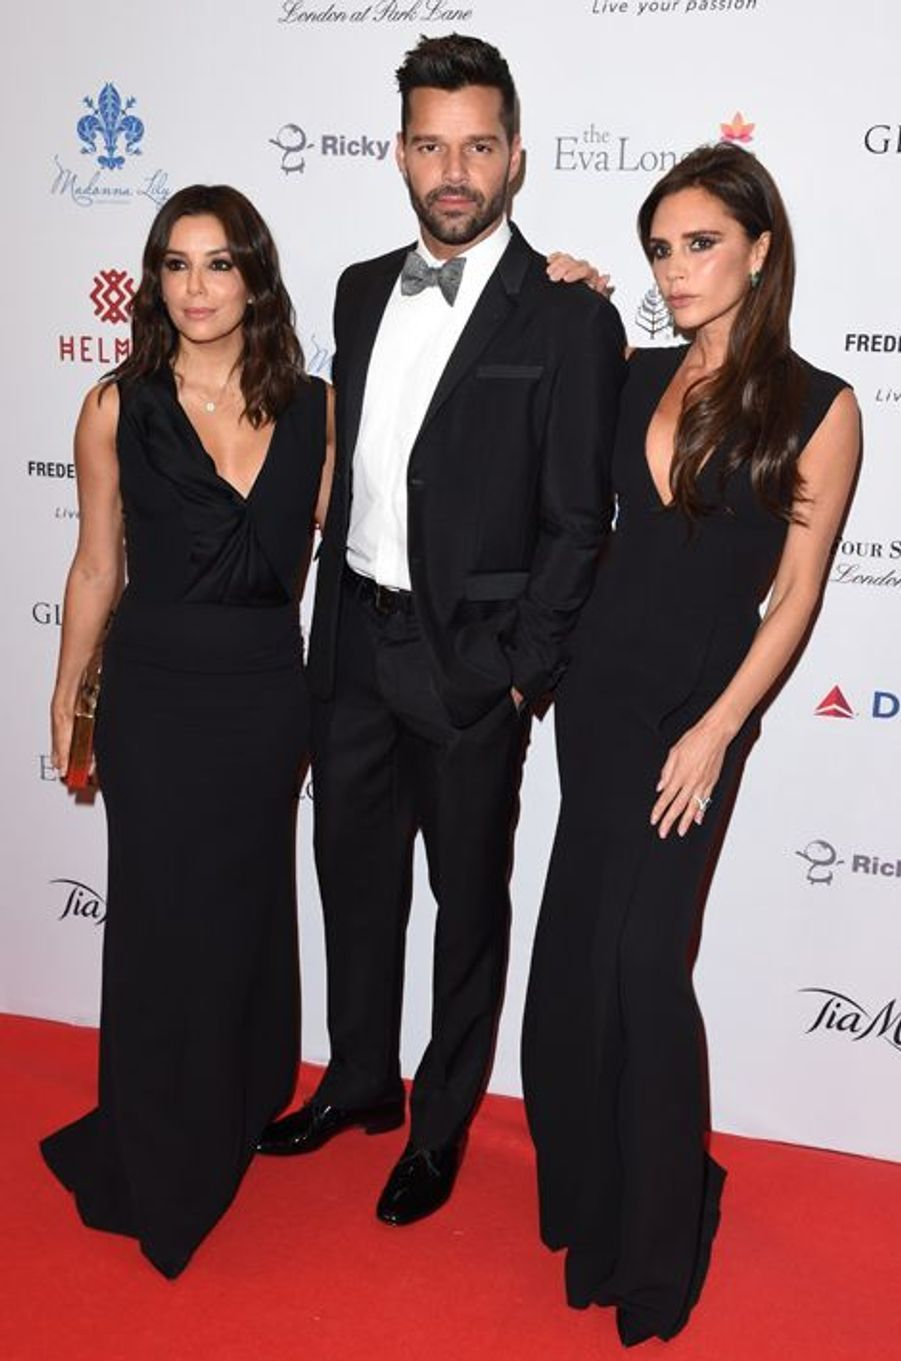 Eva Longoria, Ricky Martin et Victoria Beckham à Londres le 17 novembre 2014